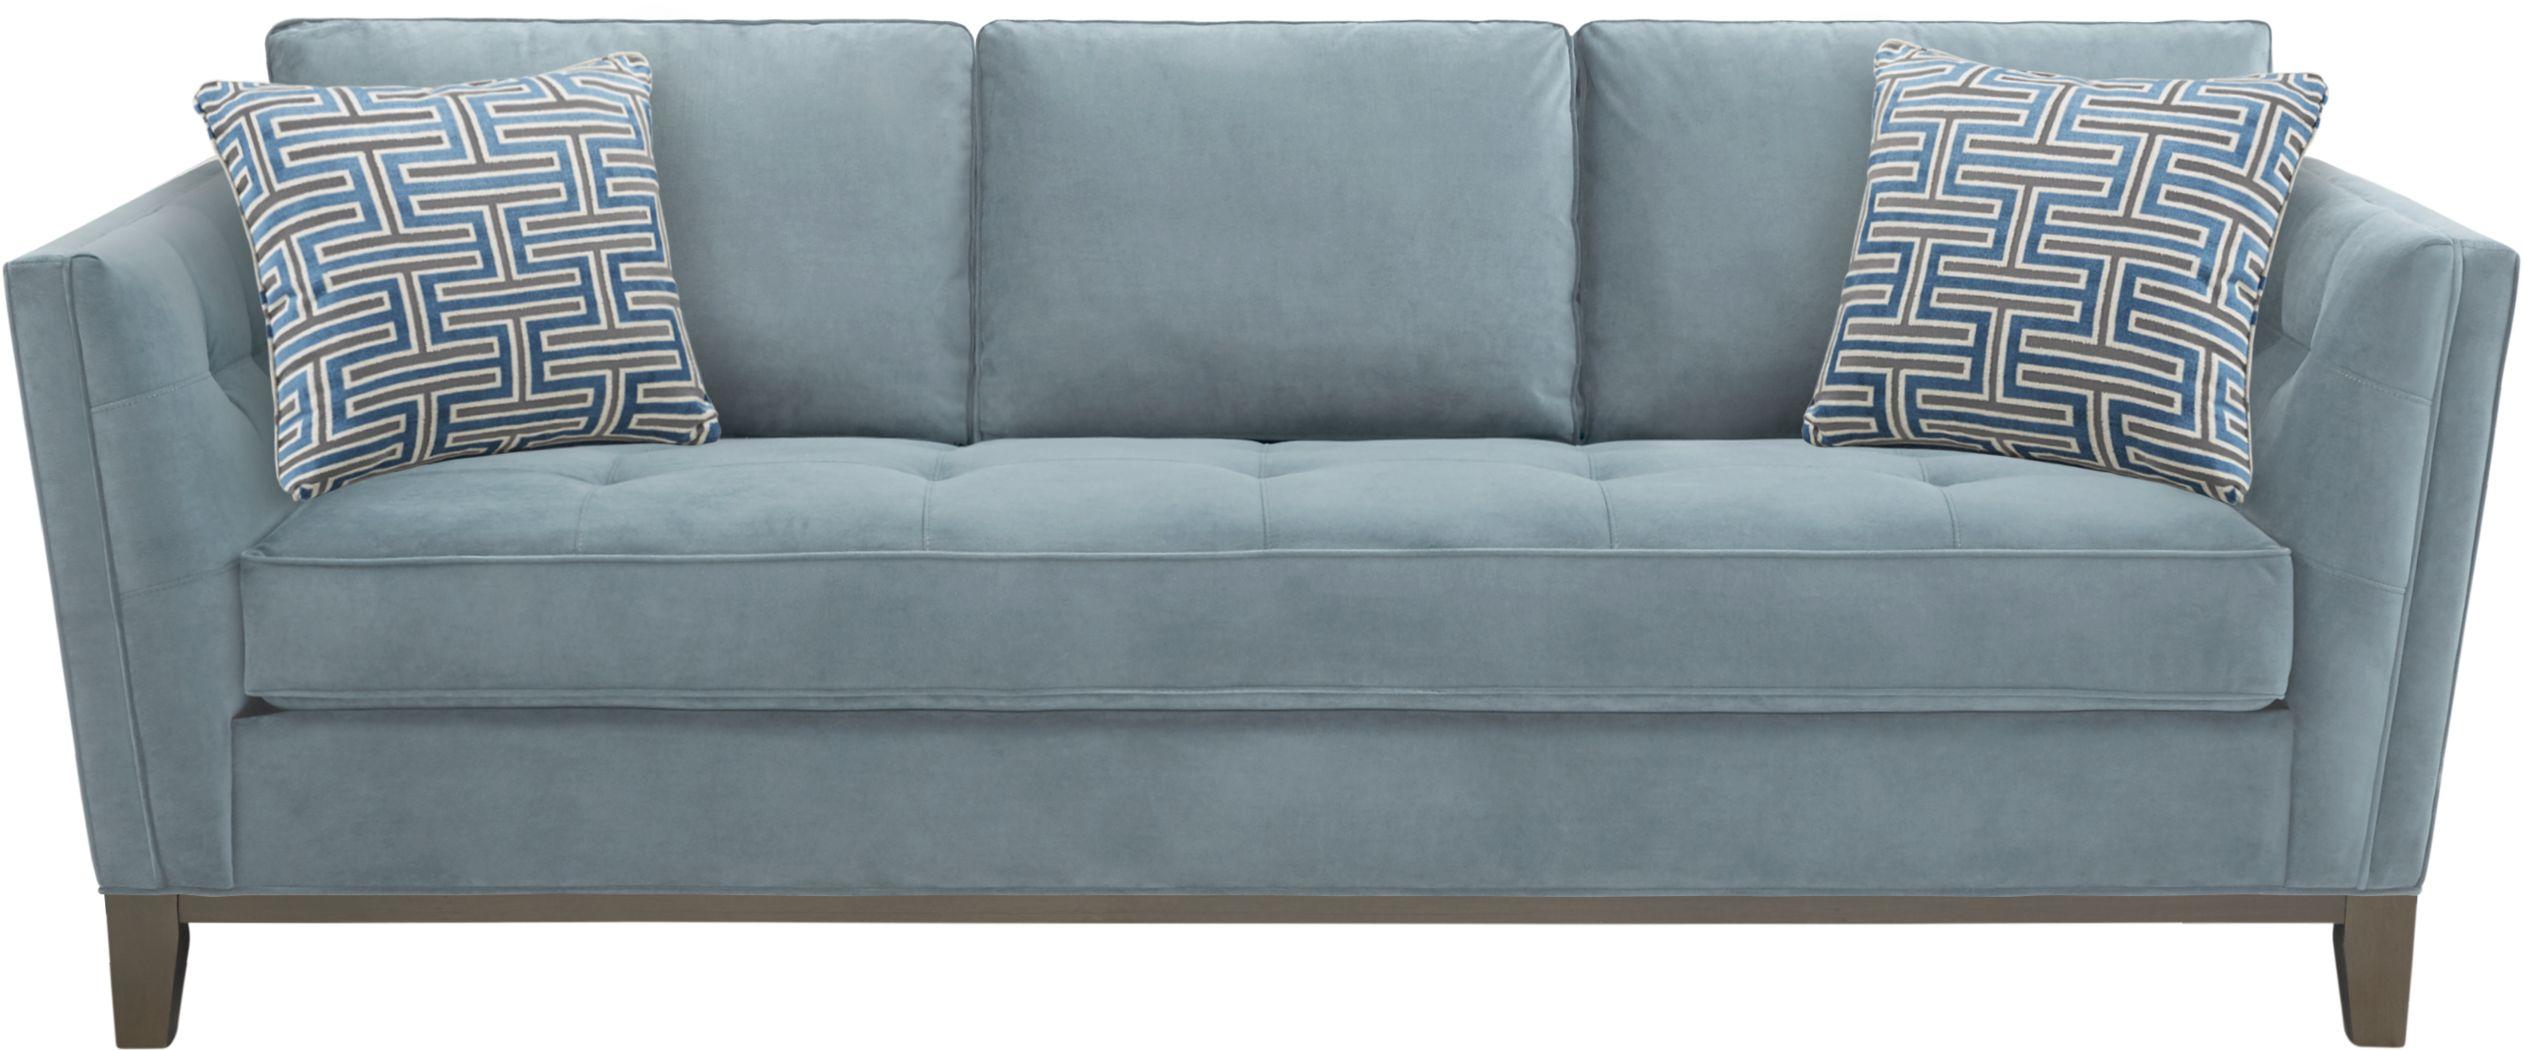 Cindy Crawford Home Park Boulevard Ocean Plush Sofa